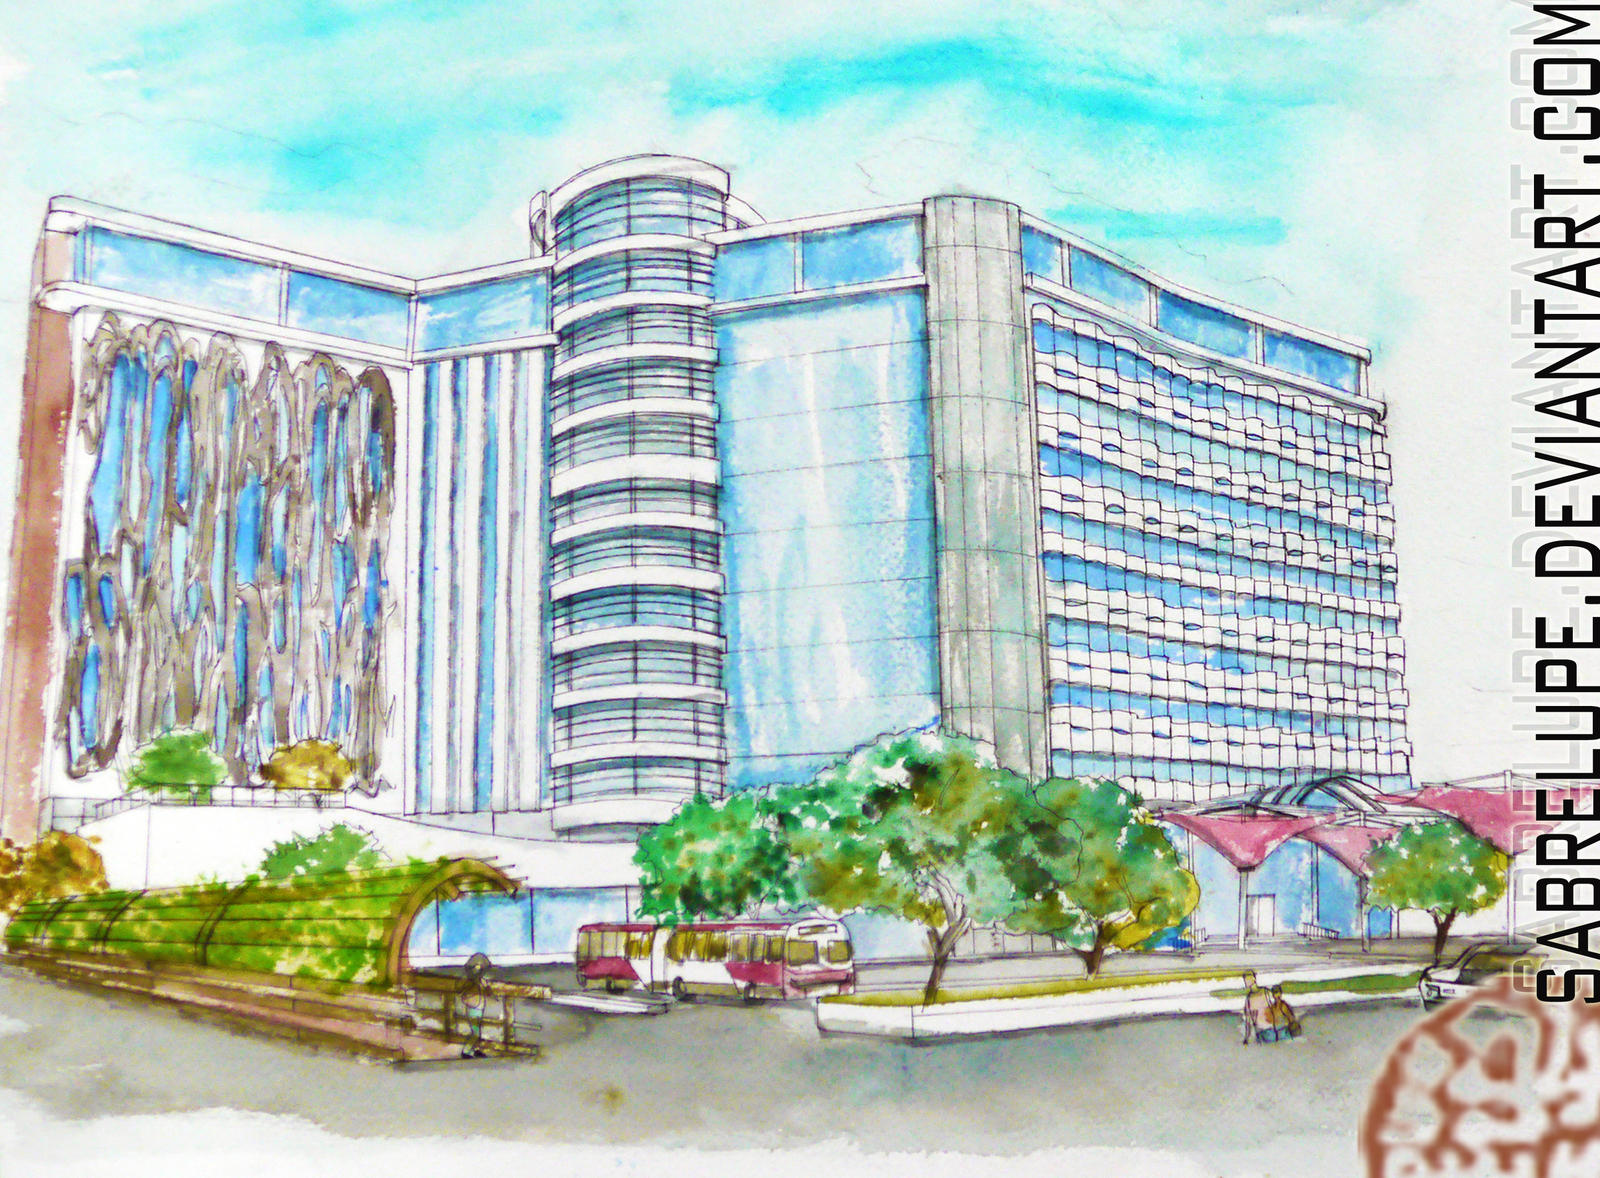 Hotel Designs contemporary hotel design in watercolorsabrelupe on deviantart